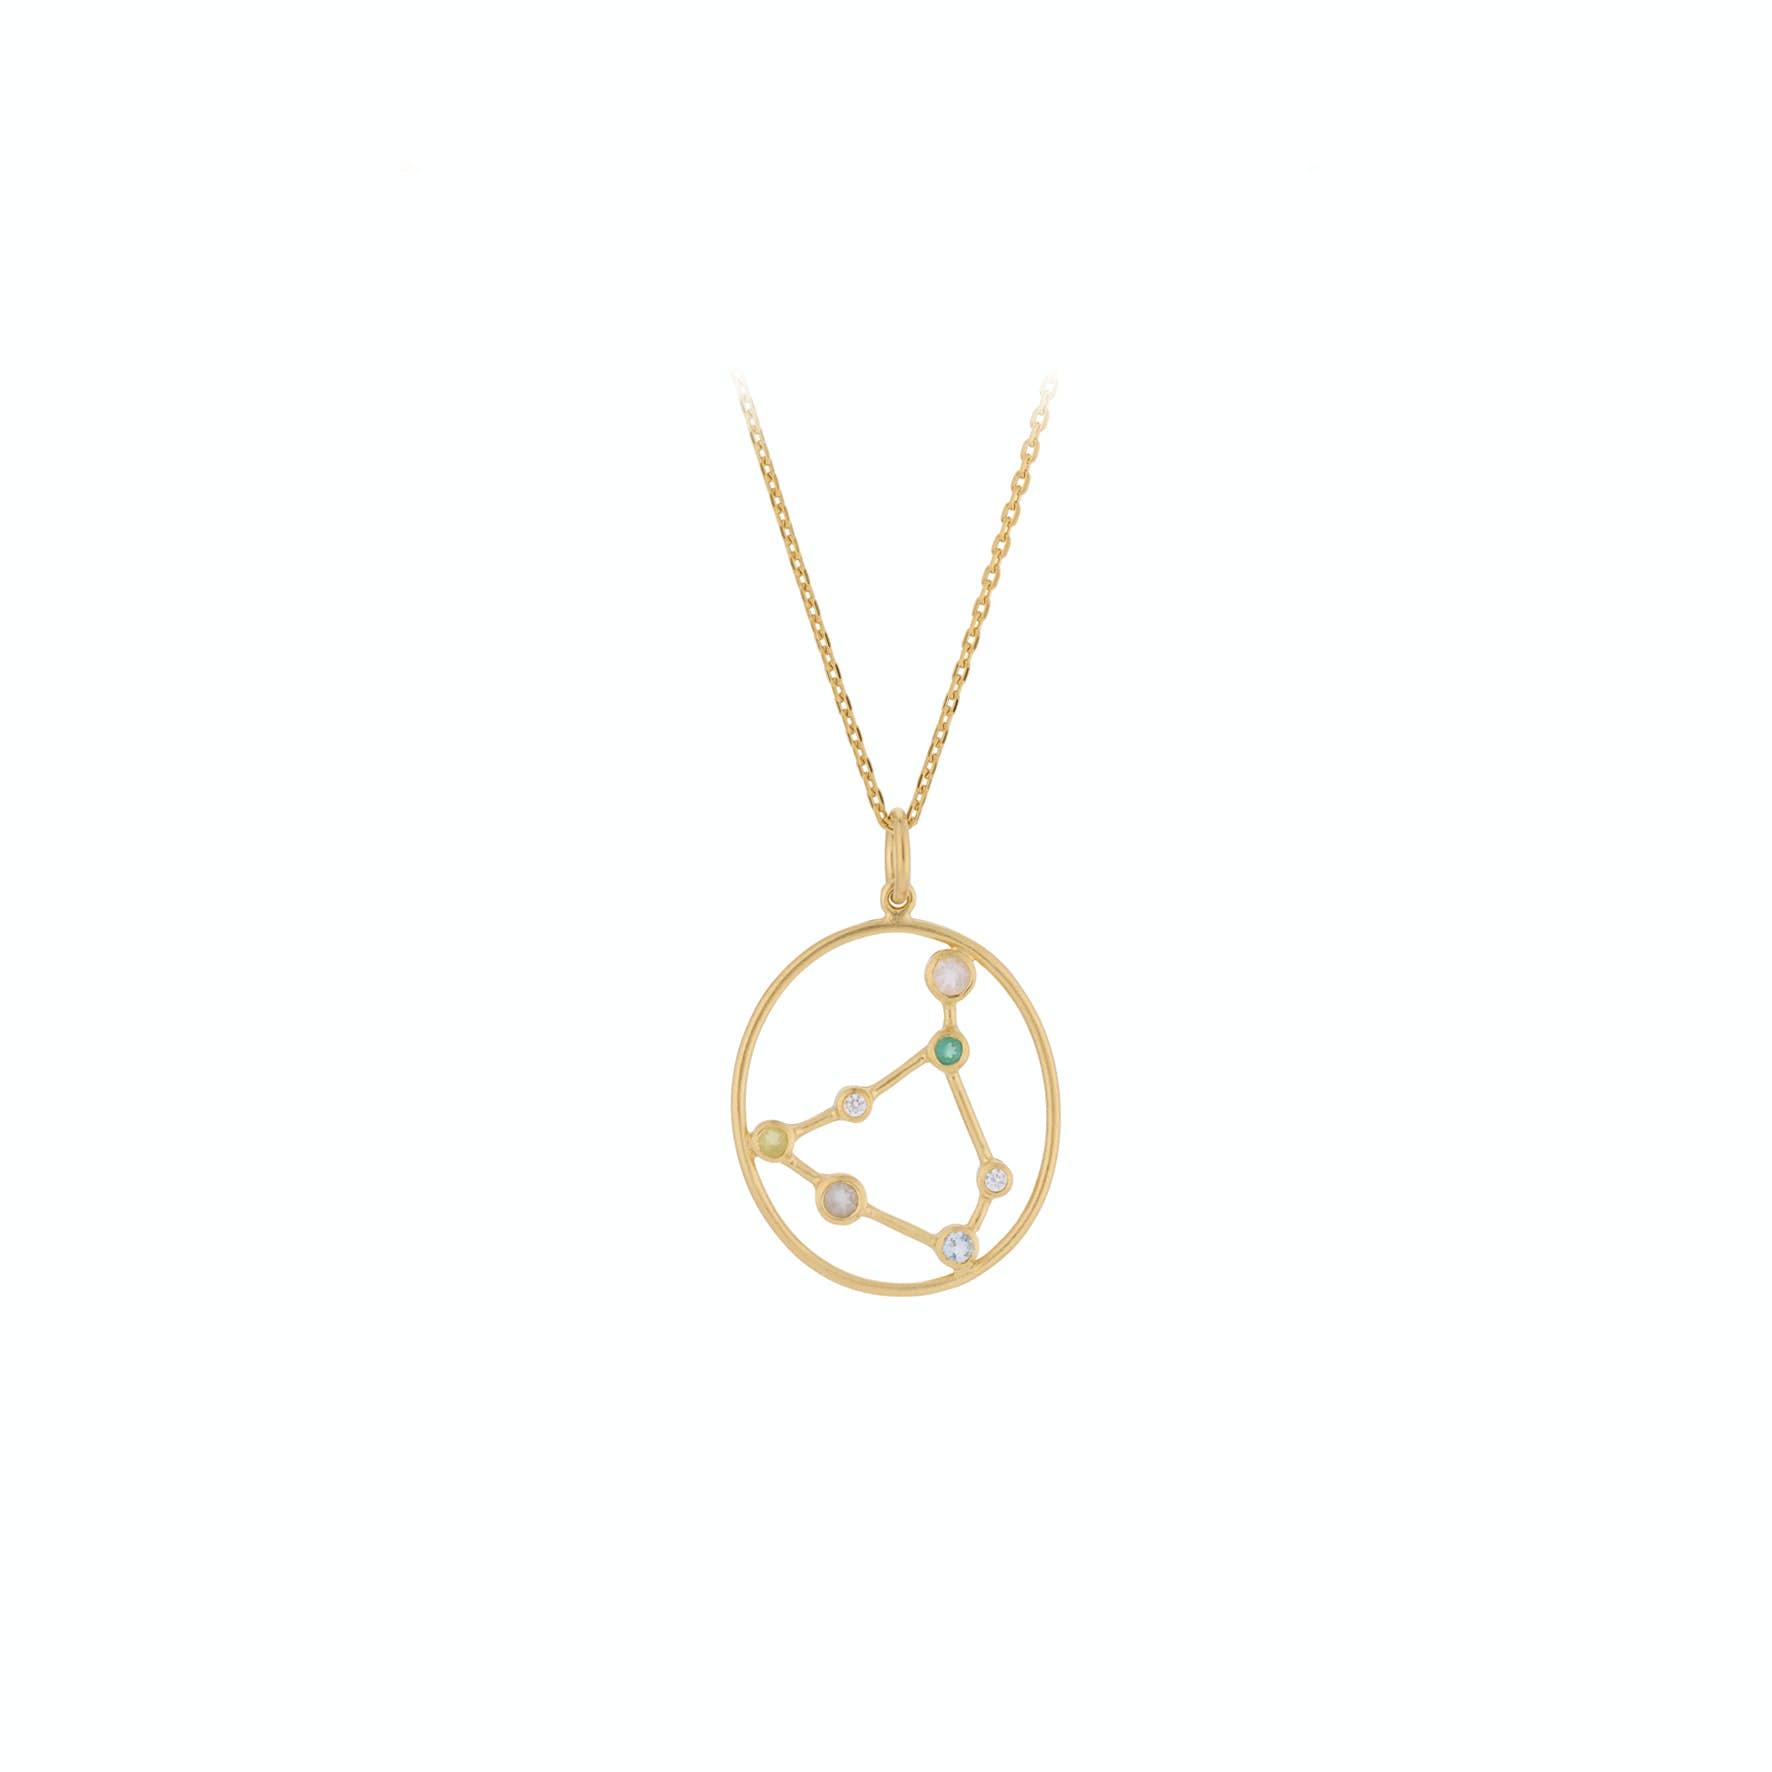 Zodiac Capricorn Necklace (Dec 22 - Jan 19) von Pernille Corydon in Vergoldet-Silber Sterling 925